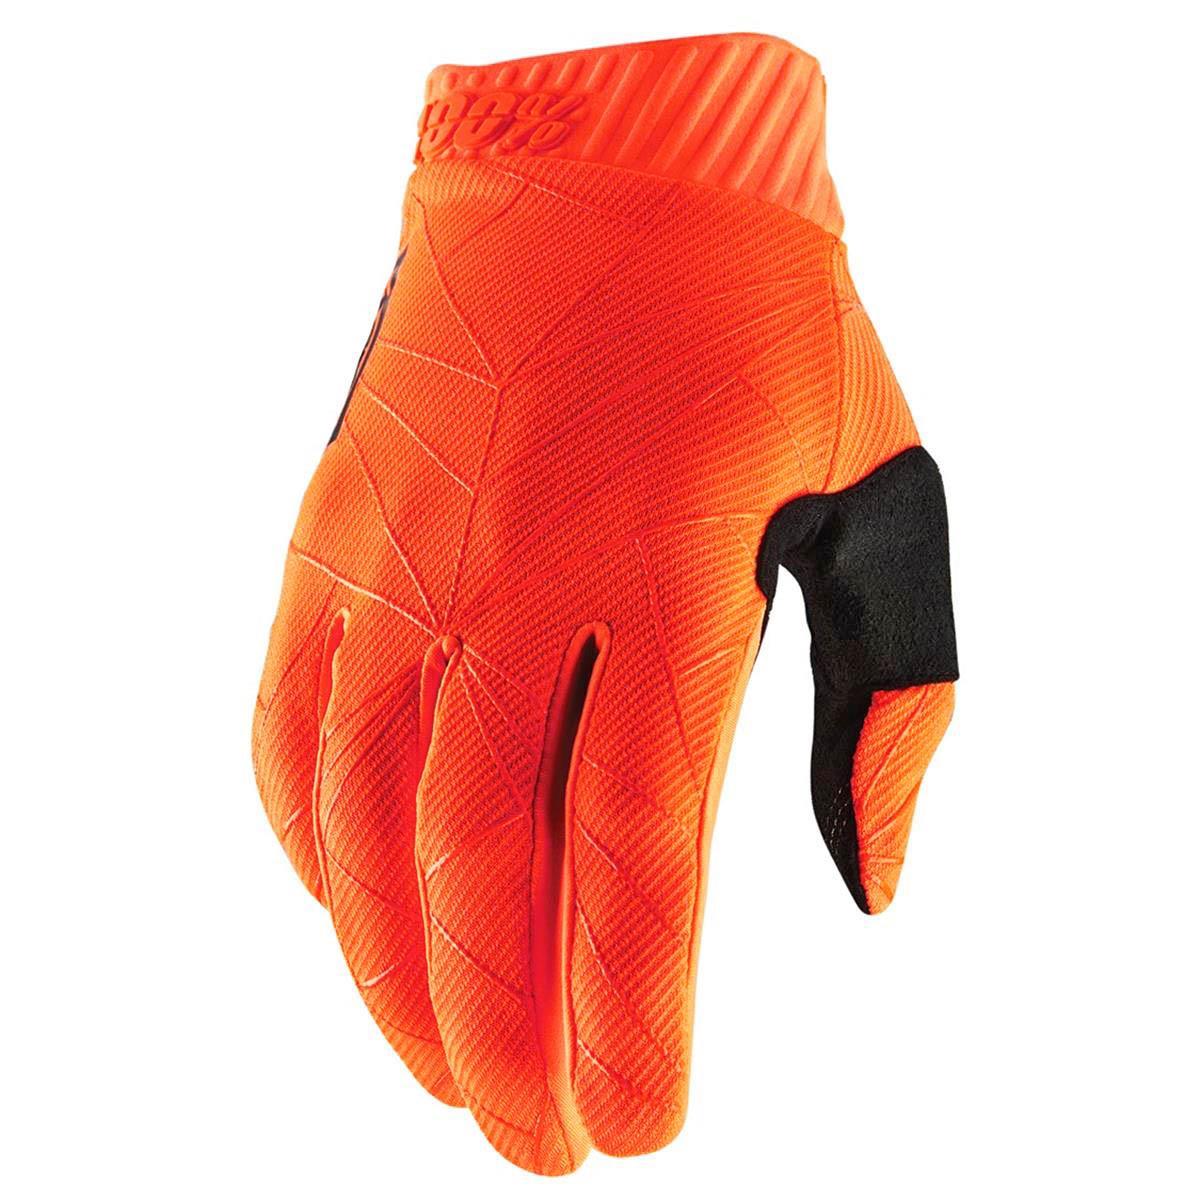 BIKE GLOVES RIDEFIT Orange/Black